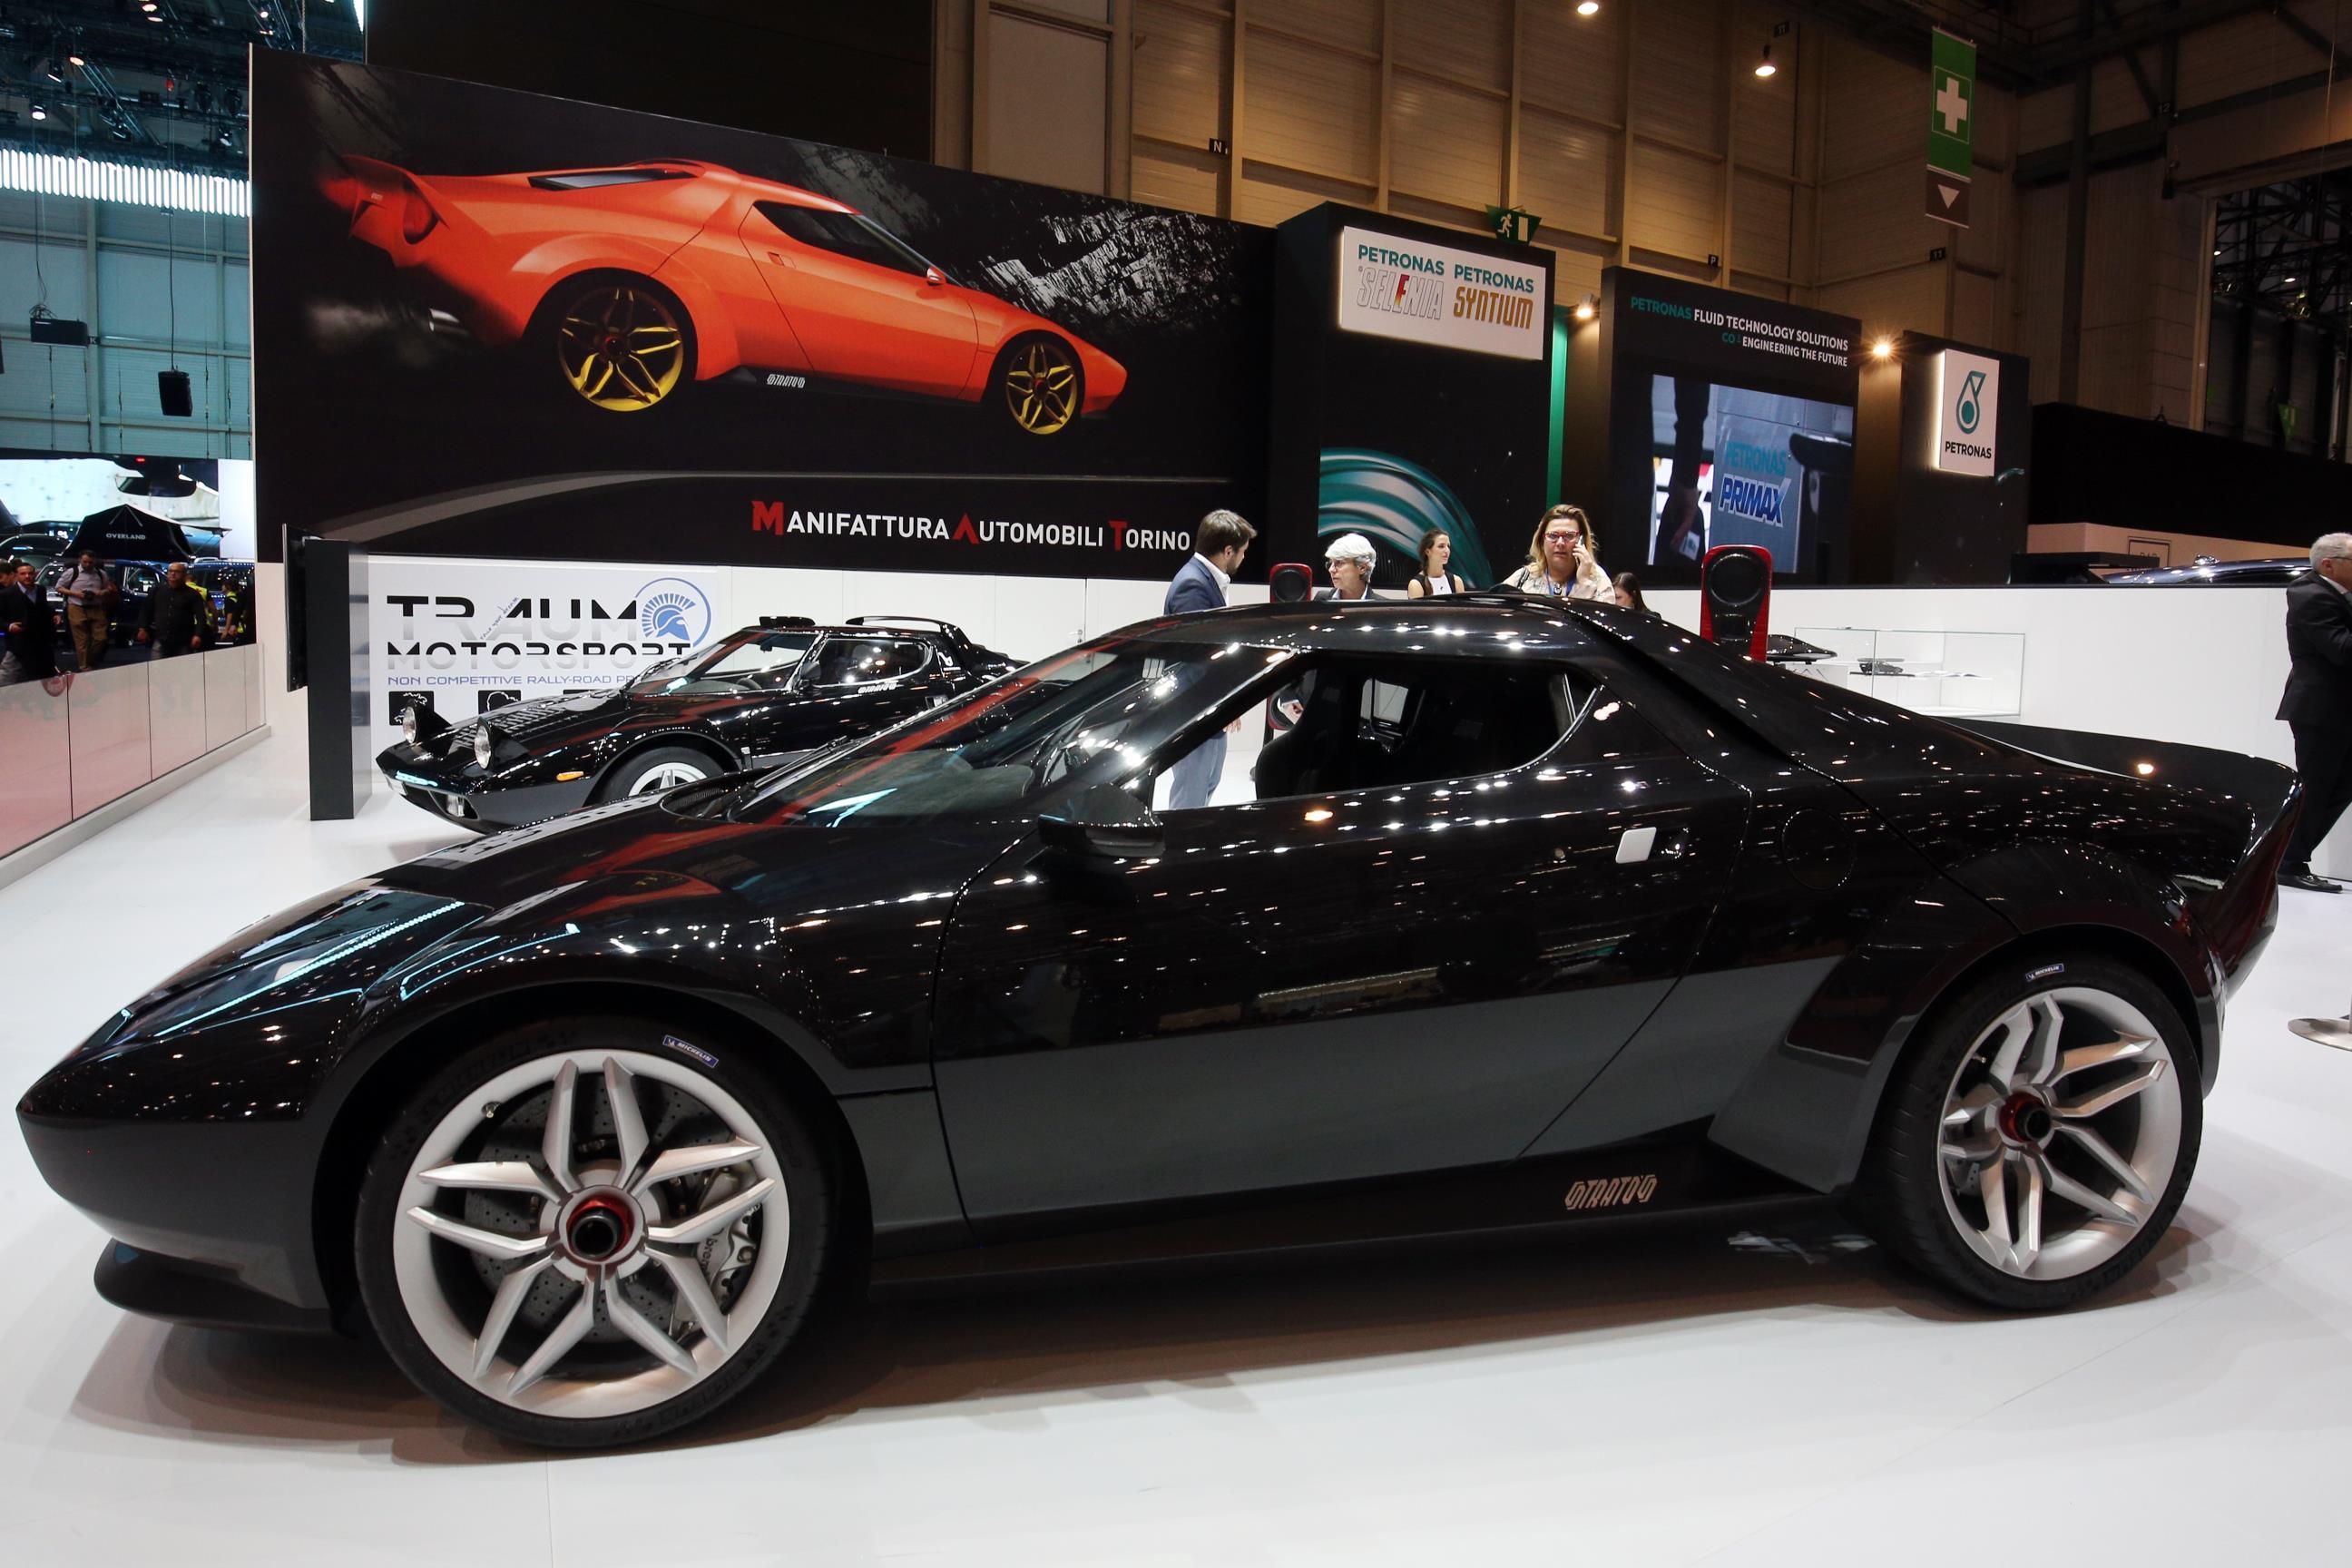 Geneva Motor Show 2018 Mega Gallery Part 2 (131)